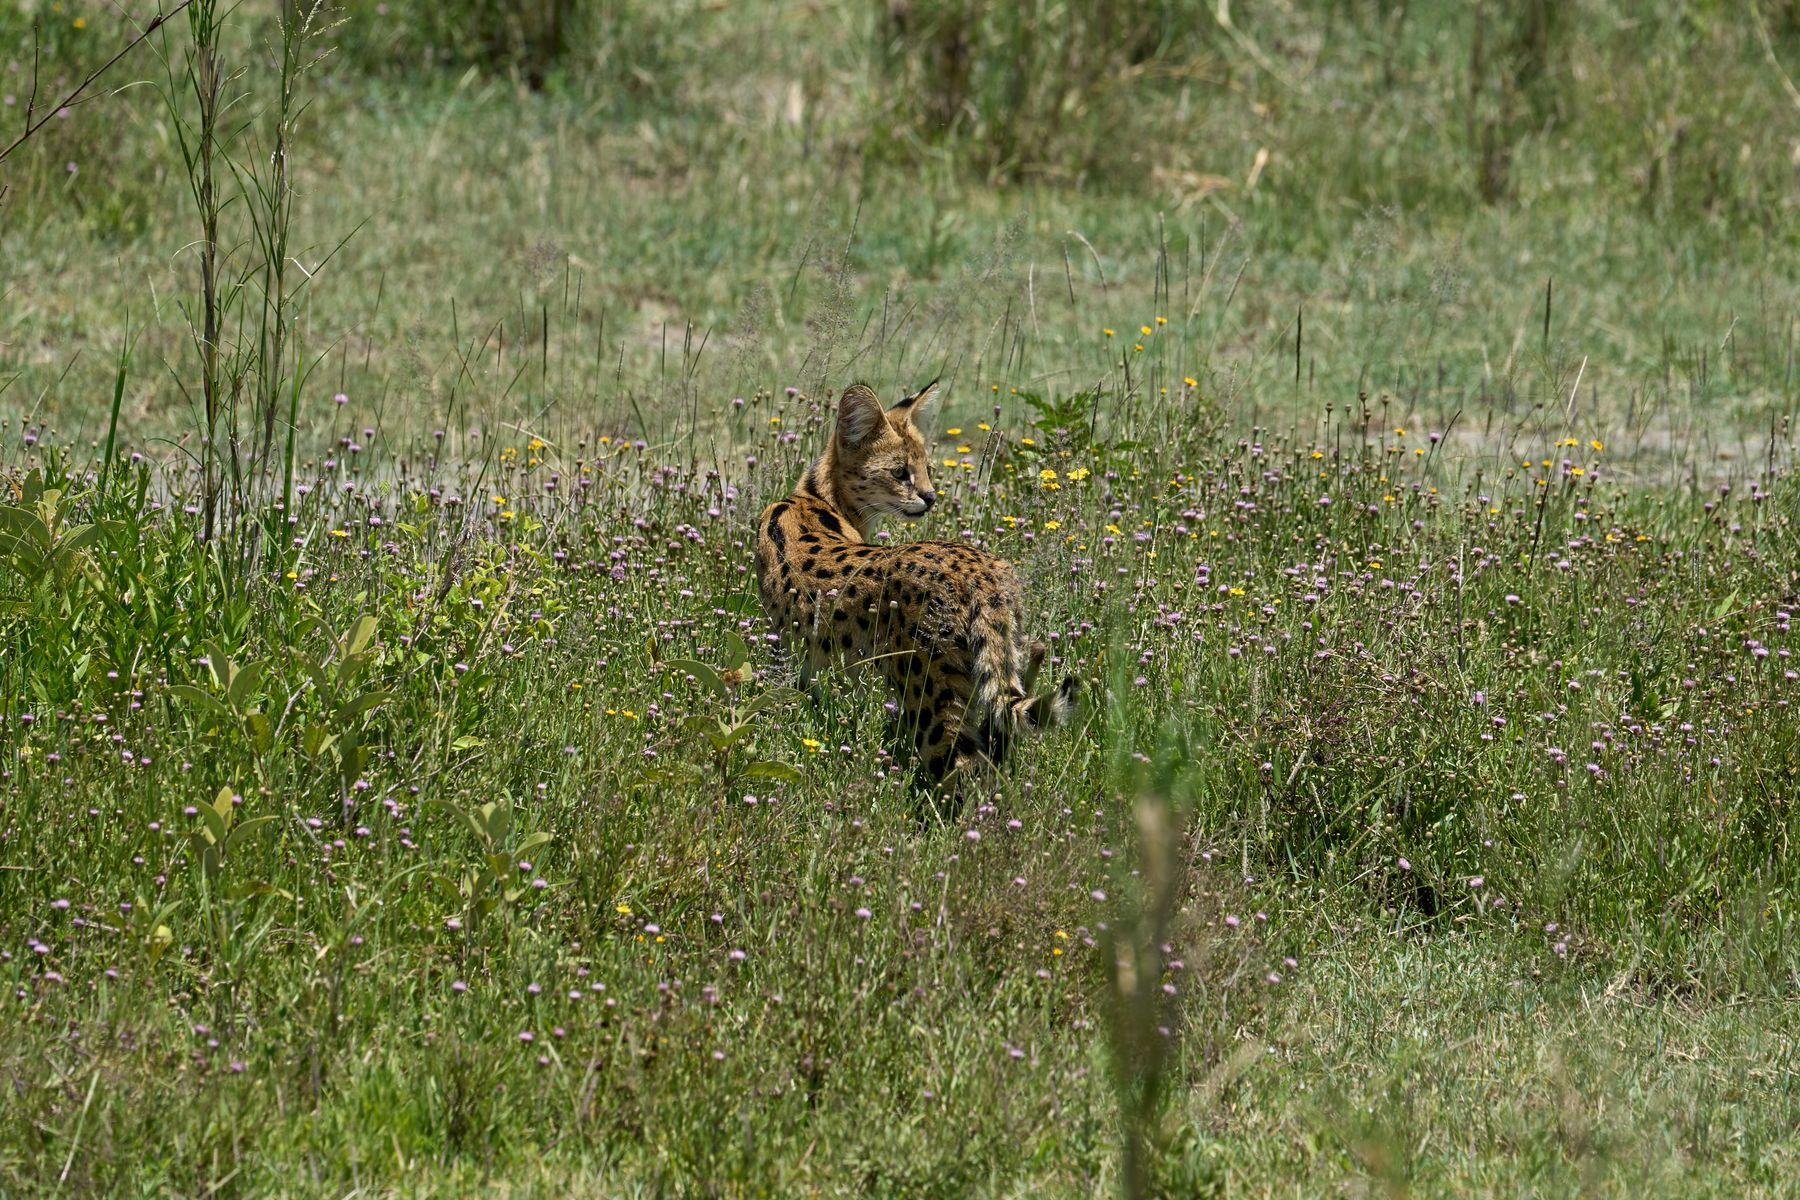 Сервал Танзания Нгоронгоро Африка природа животные кошки сервал